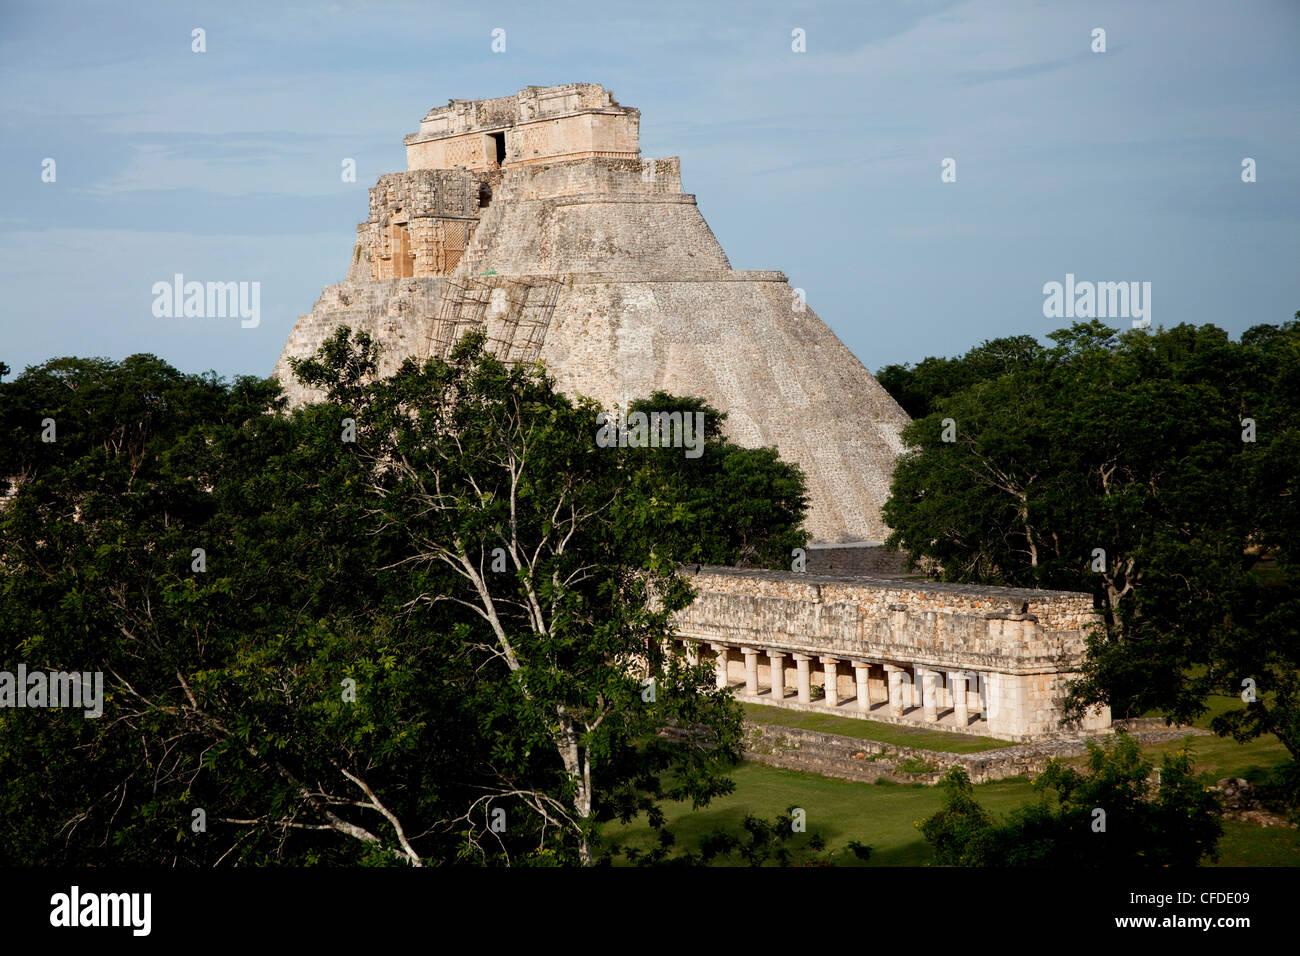 The Pyramid of the Magician, Uxmal, UNESCO World Heritage Site, Yucatan, Mexico, Stock Photo